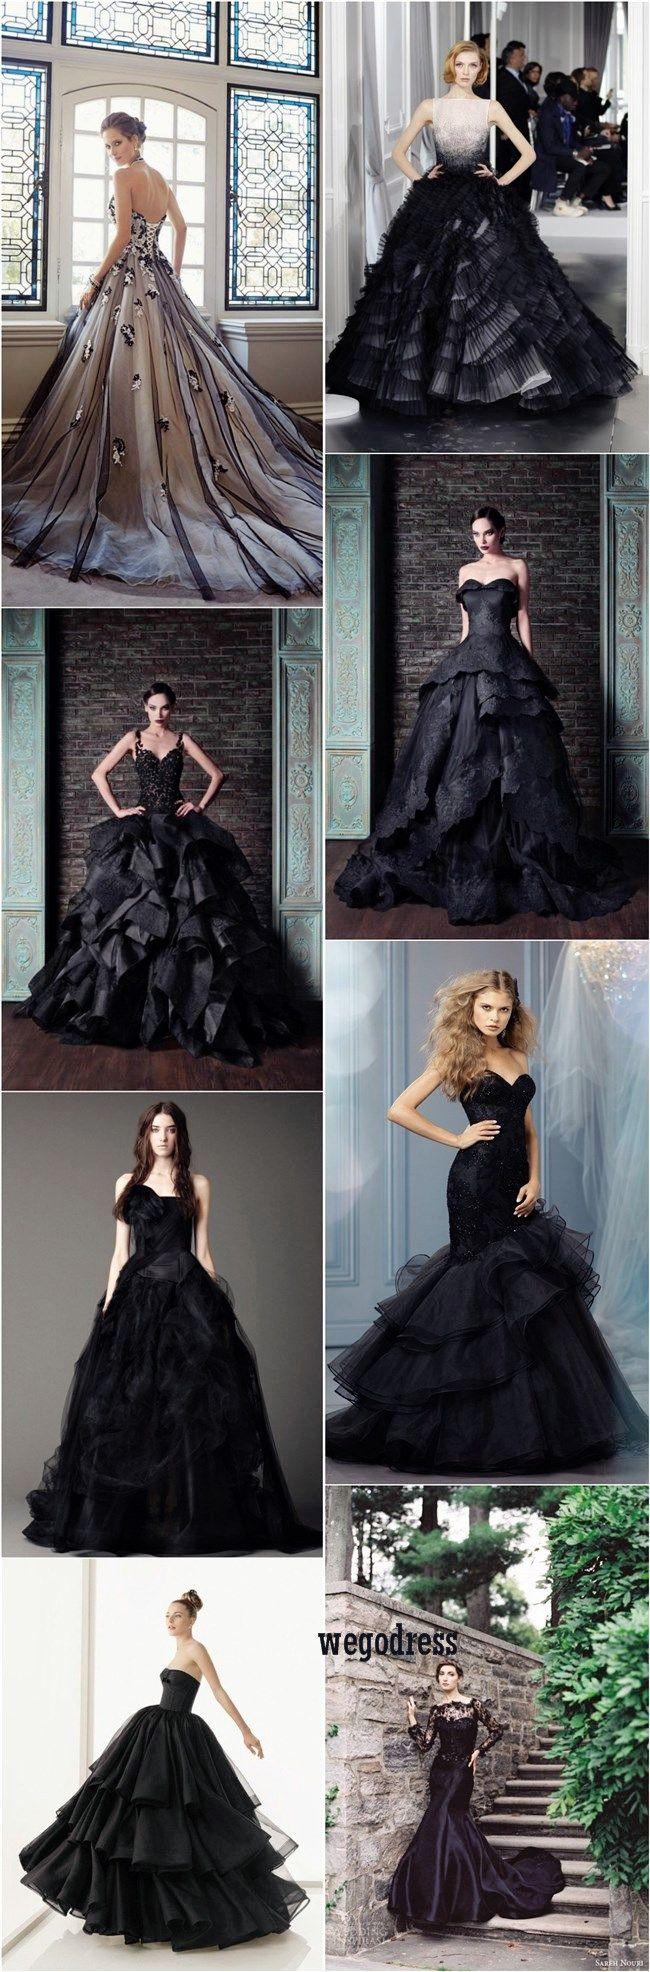 black wedding dress                                                                                                                                                                                 More